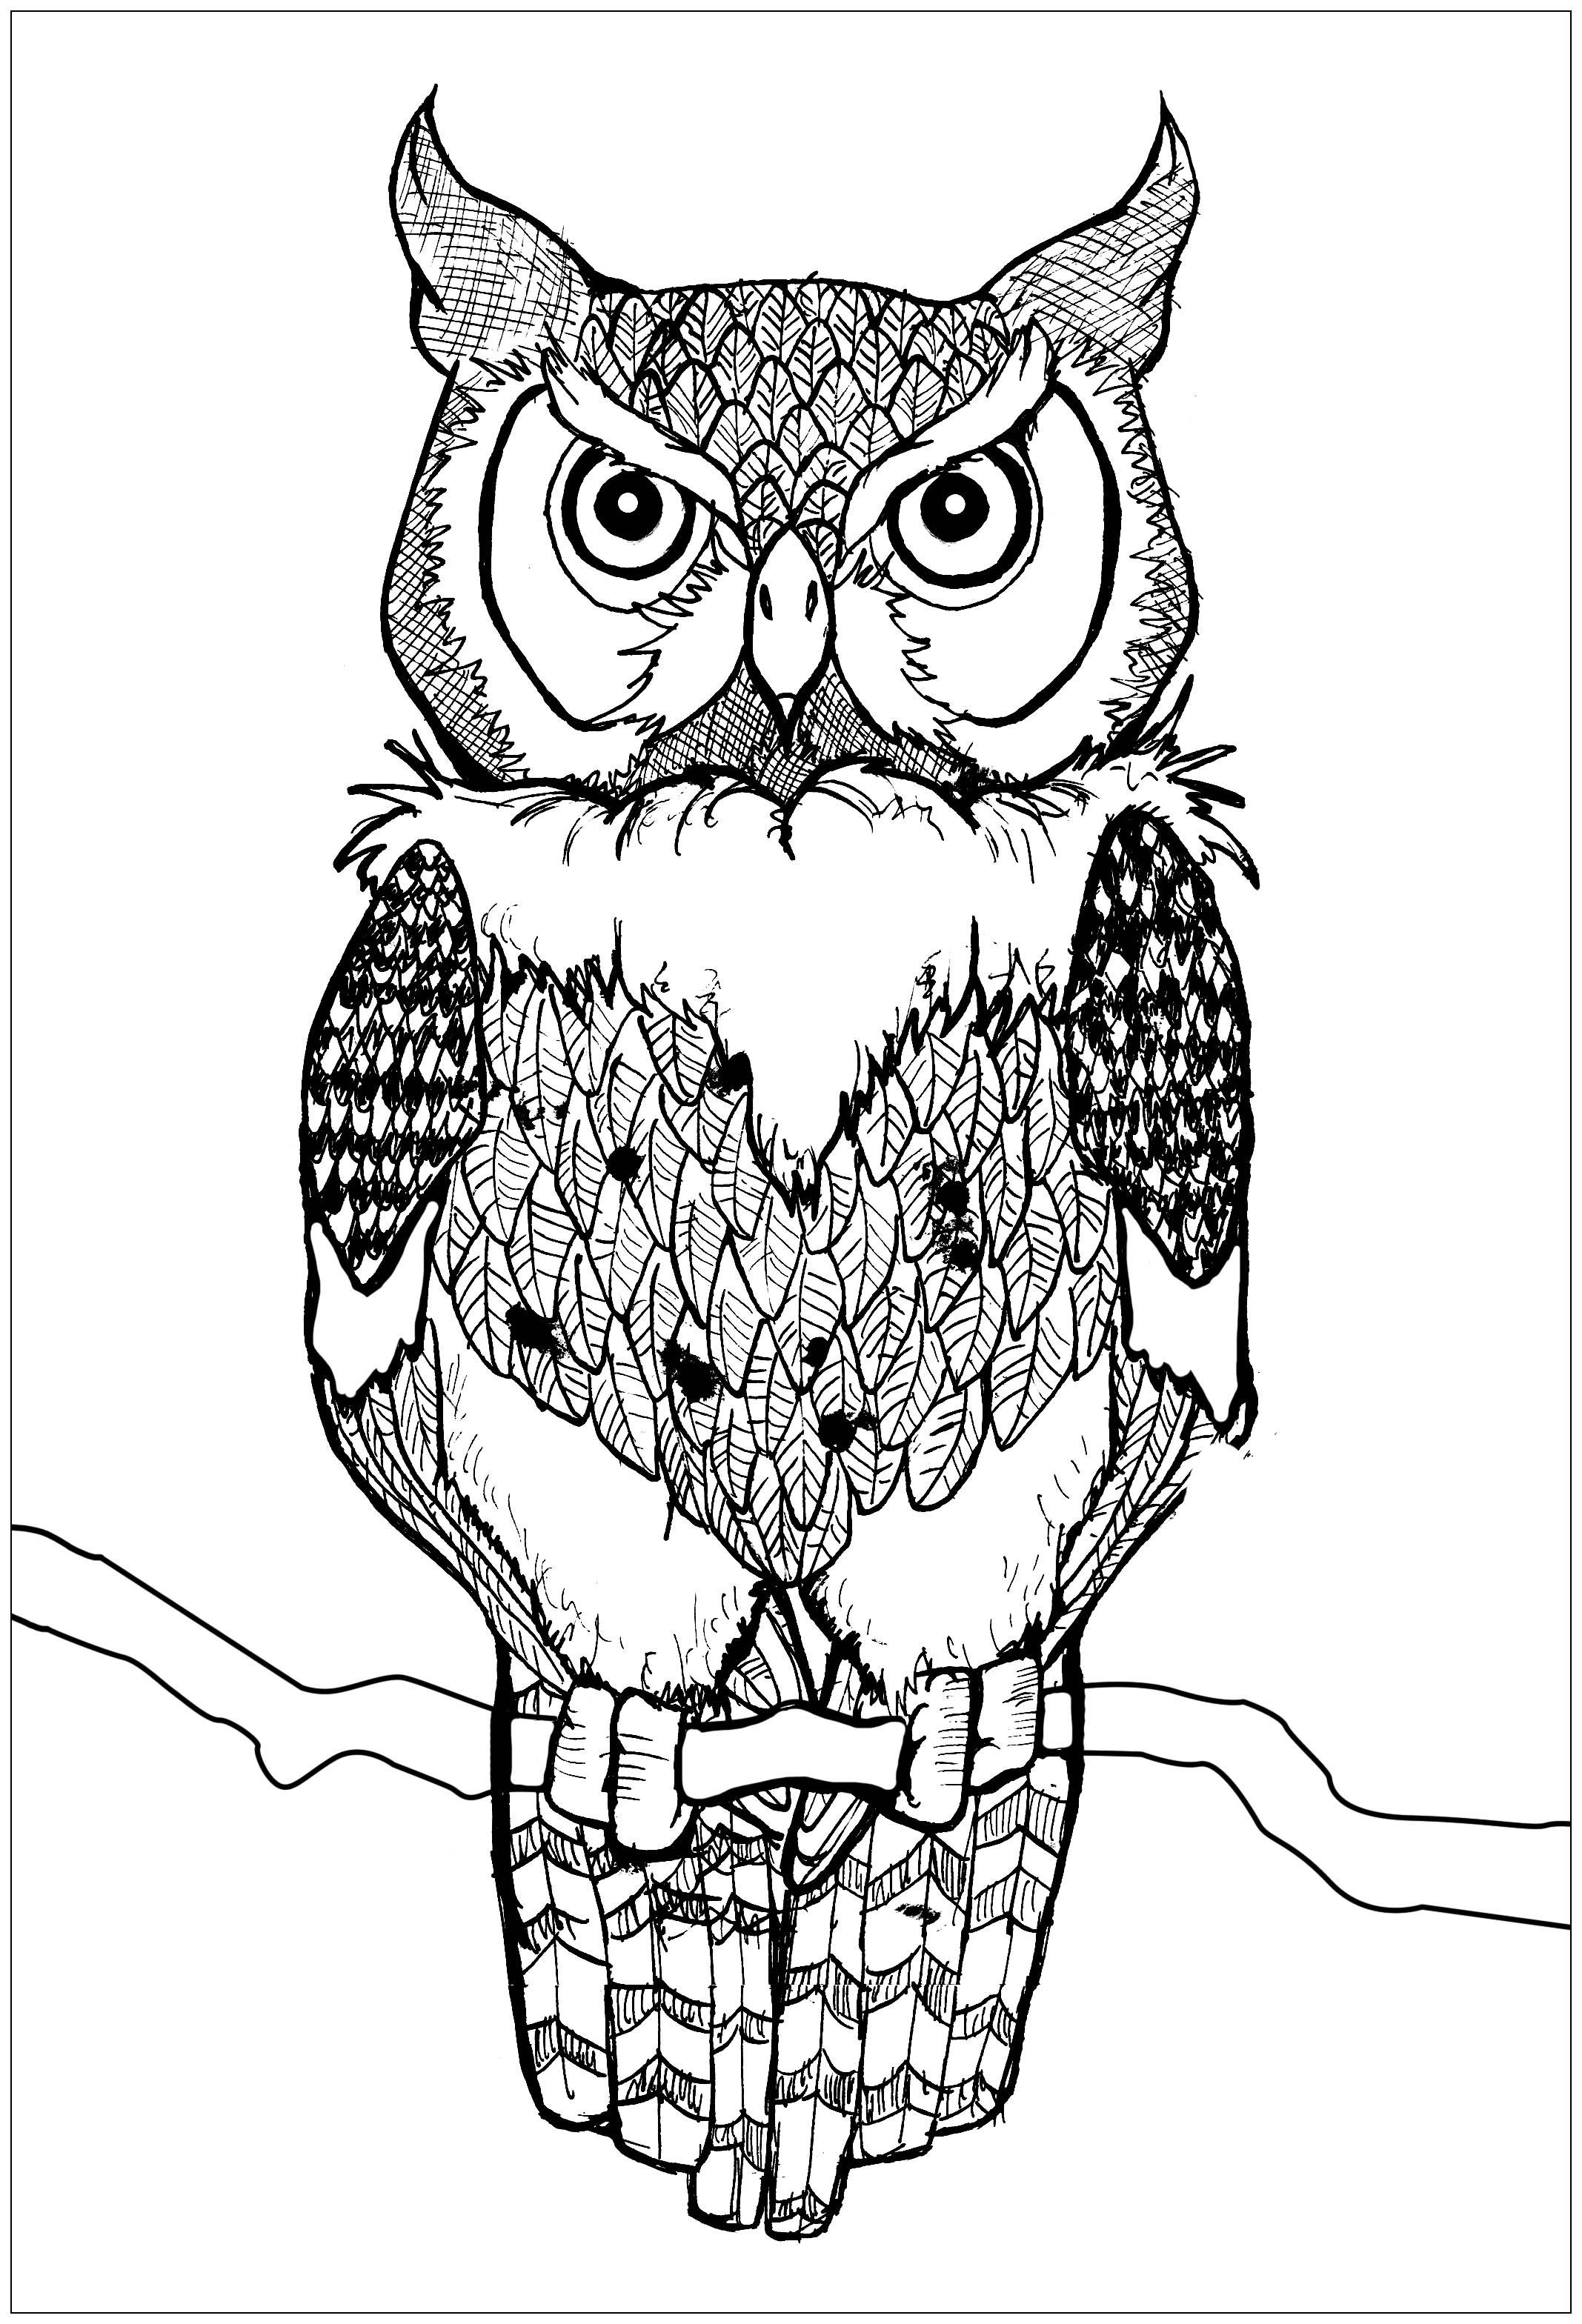 Joli hibou yeux percants coloriage de hiboux coloriages pour enfants - Coloriage de hibou ...